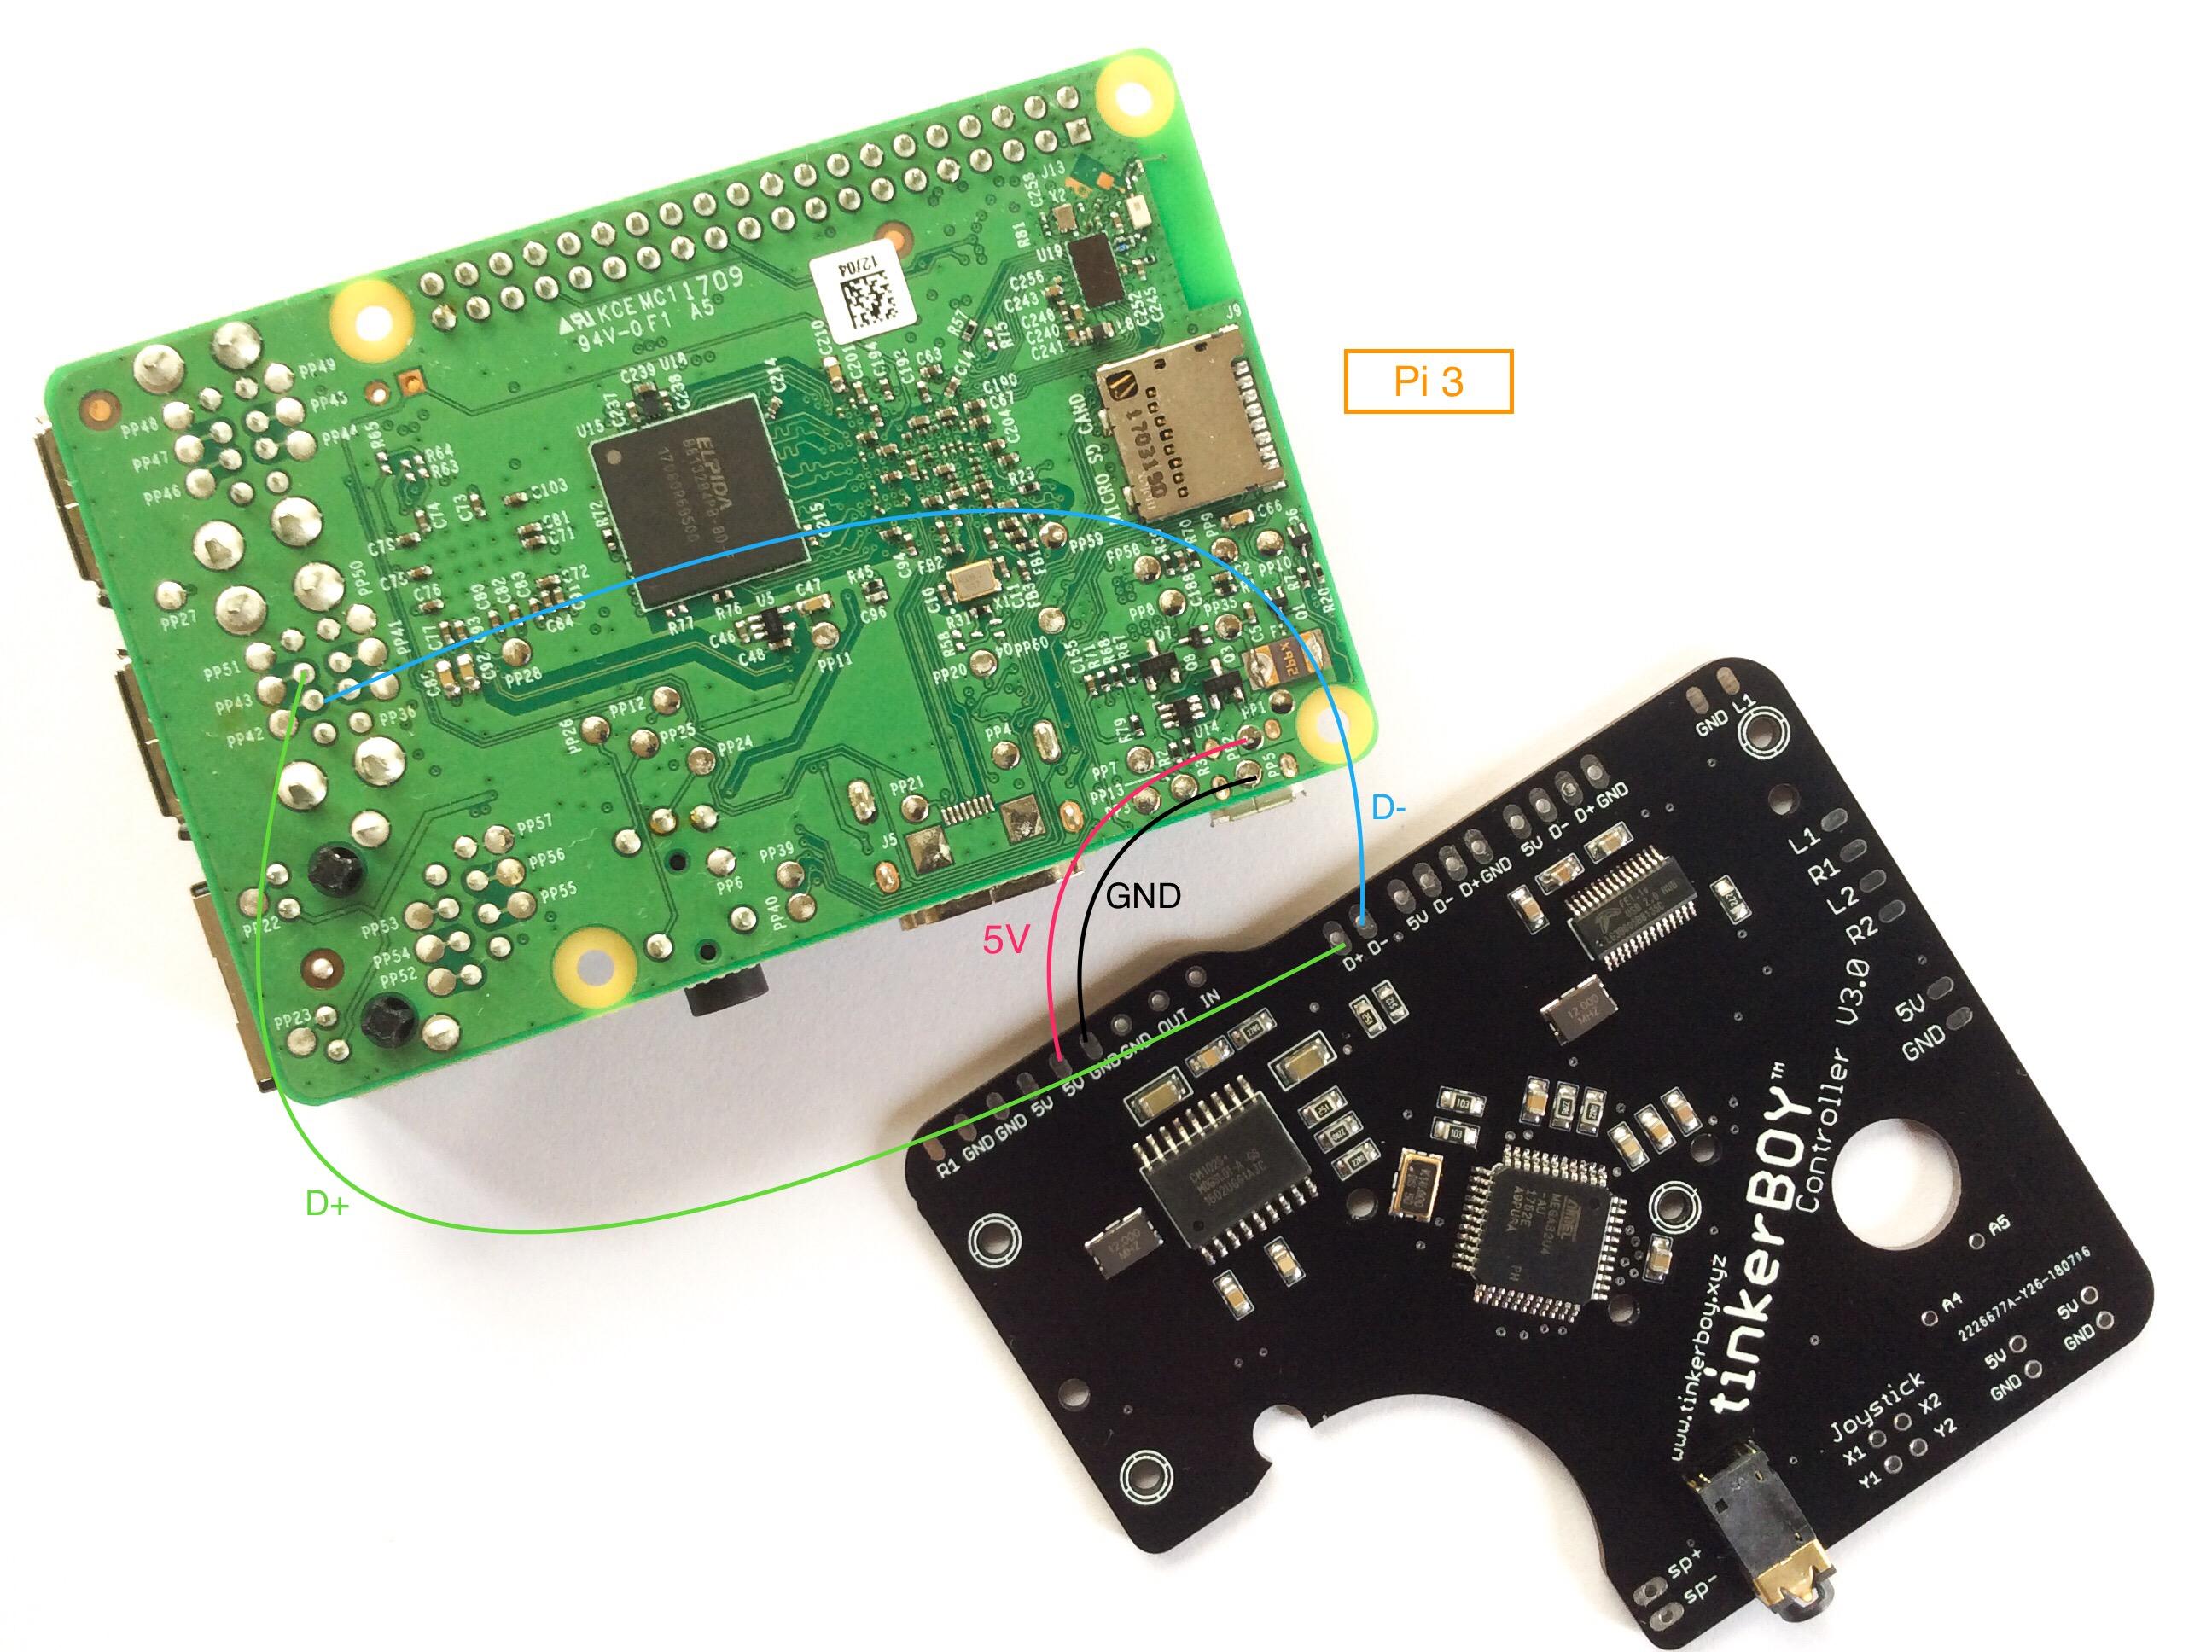 N64 Wiring Diagram Library Sega Genesis For Tinkerboy Controller V30 Pi 3